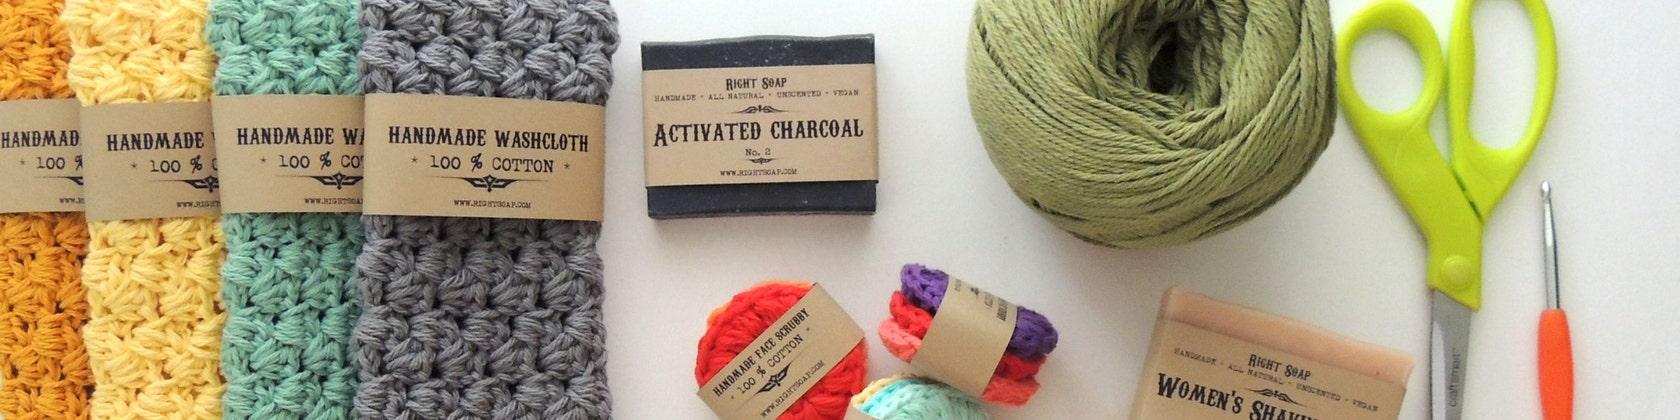 Handmade Soap Natural Soap Vegan Soap Unscented soap von RightSoap